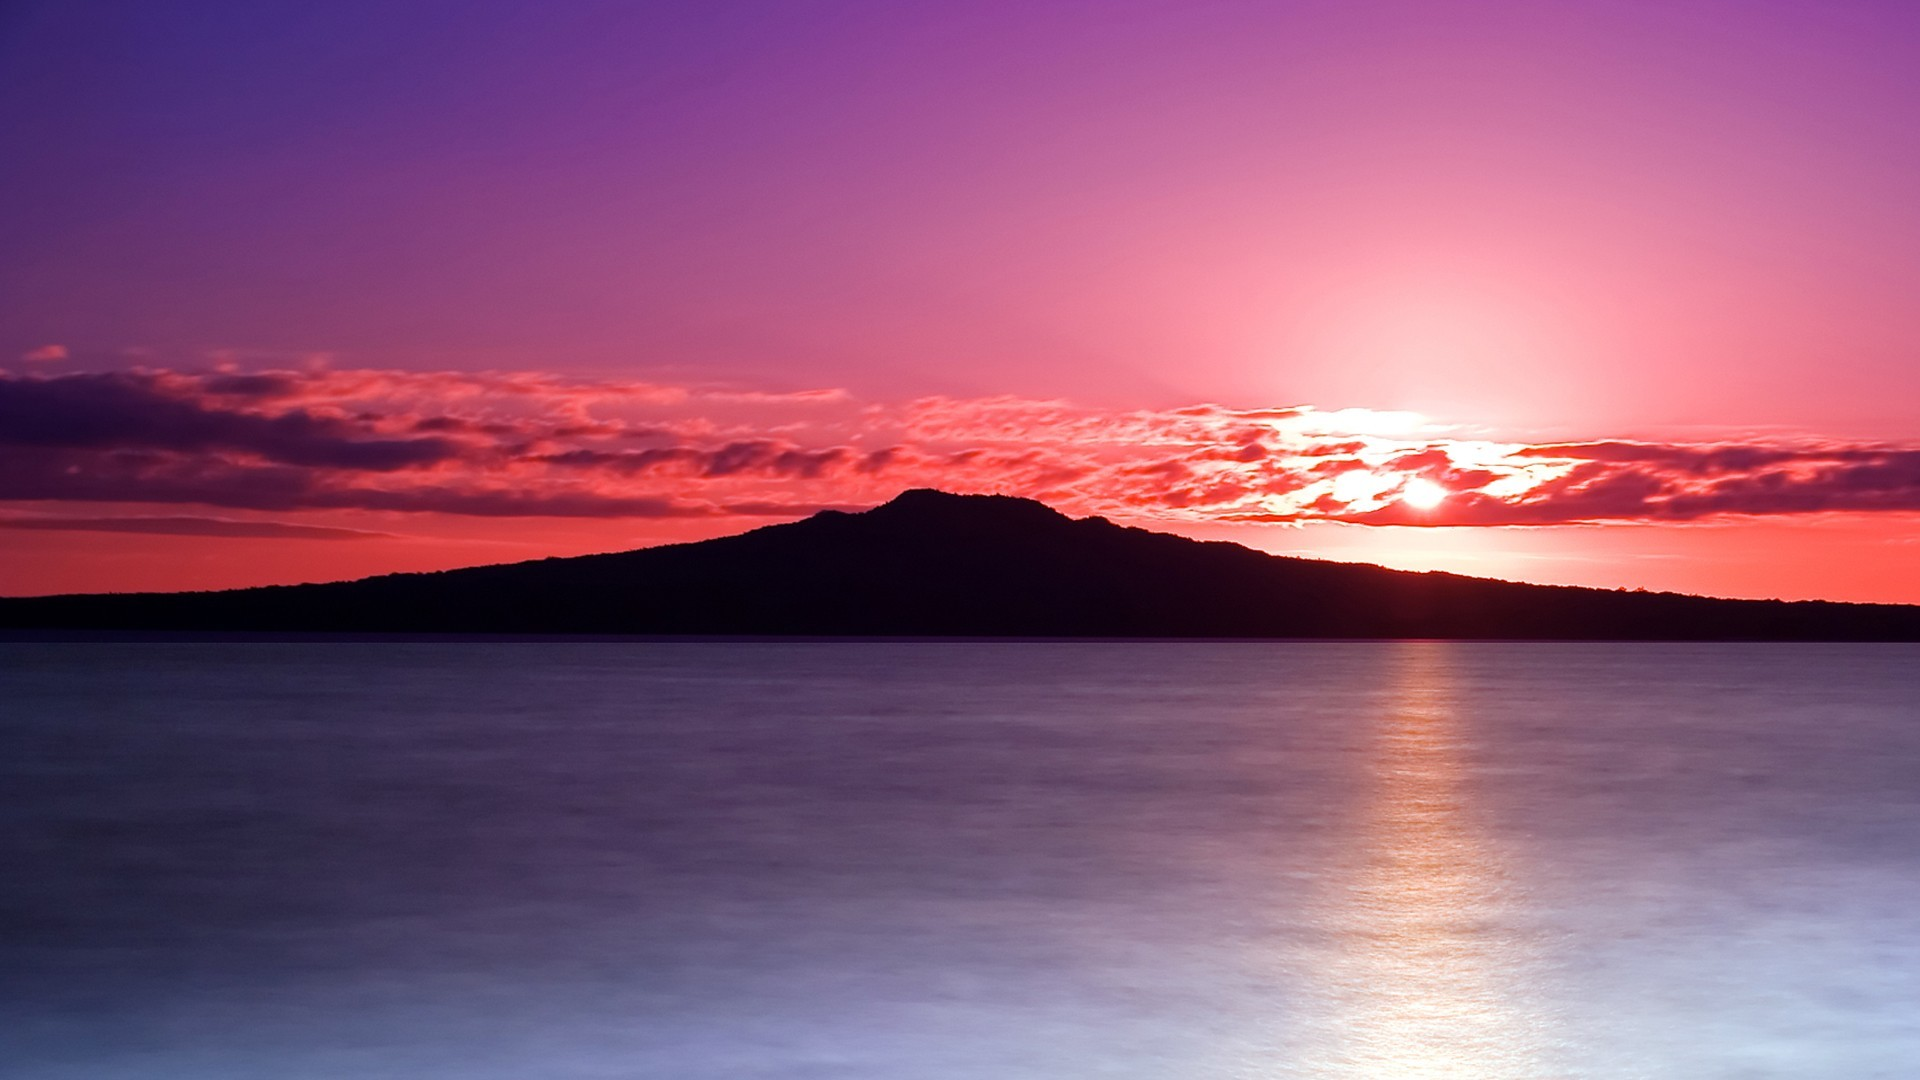 Purple Reflection Sun Sky Pink Clouds Sea Sunrise Sunset Island Stormy  Skies Wallpaper